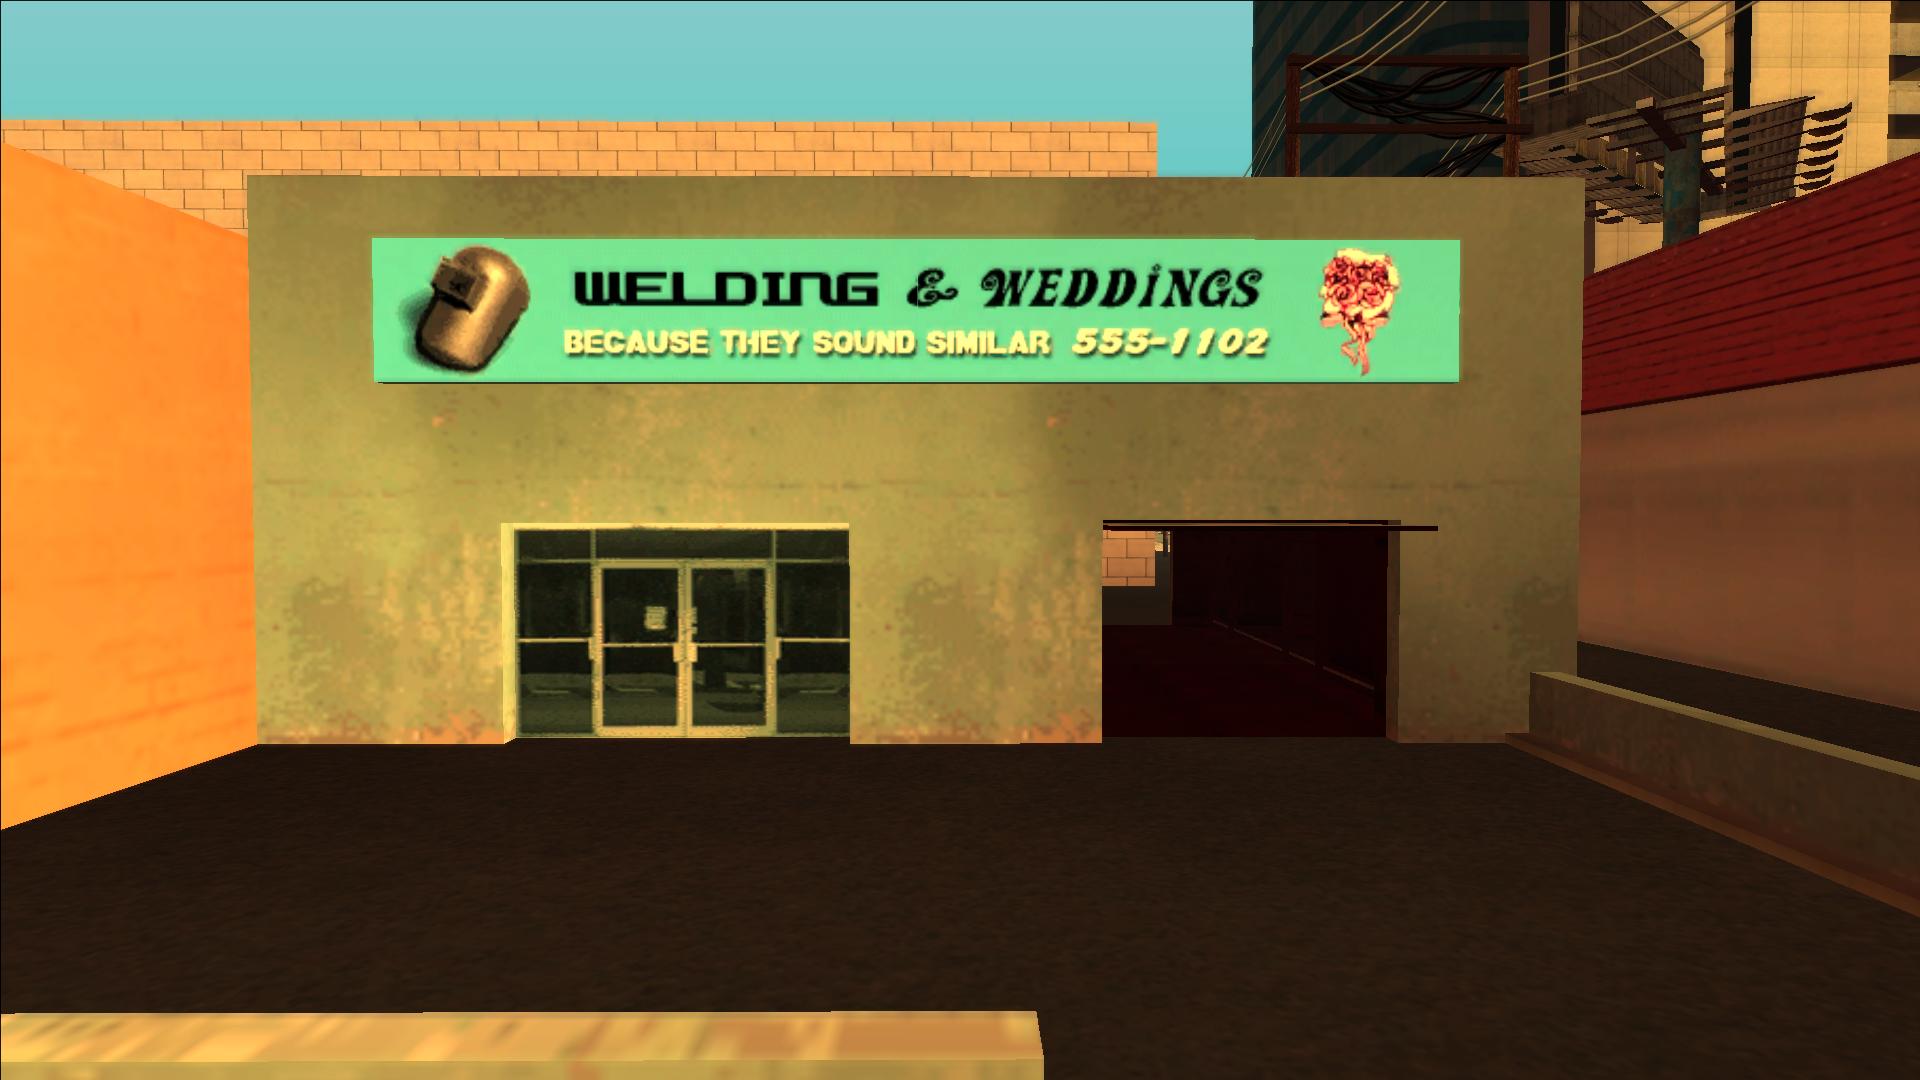 Welding & Weddings